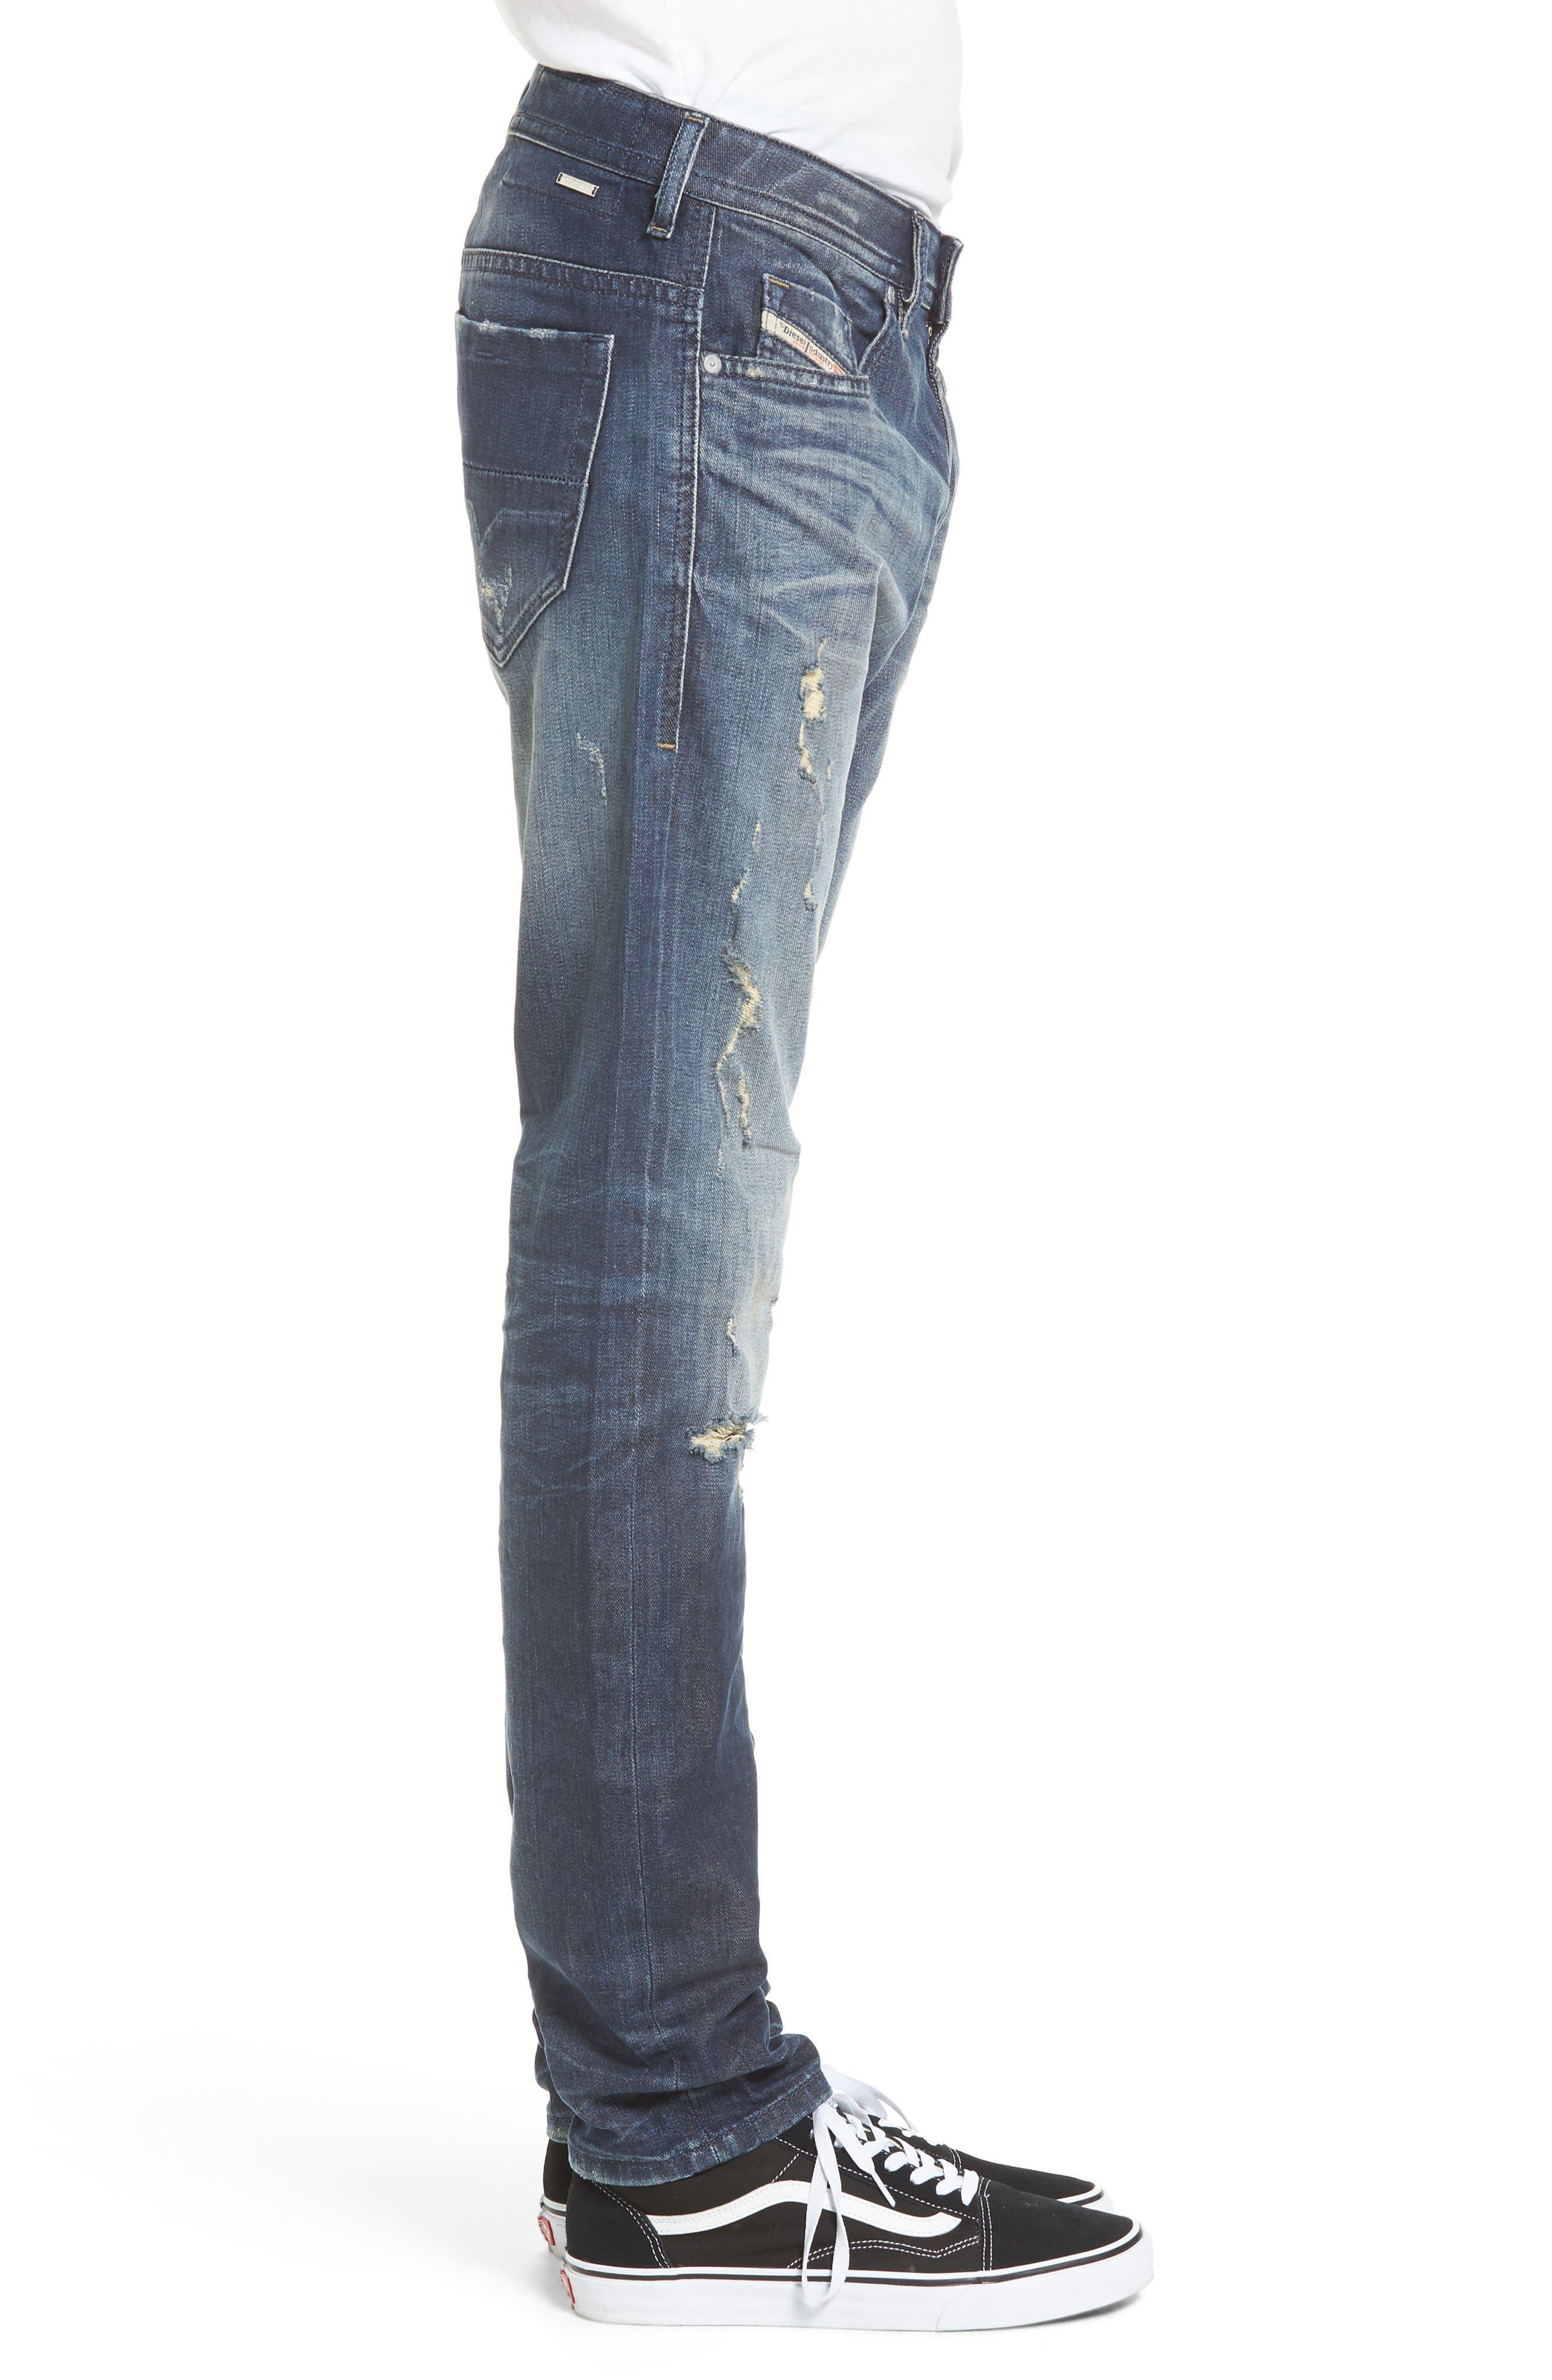 Thommer Slim Fit Jeans,                             Alternate thumbnail 3, color,                             Denim